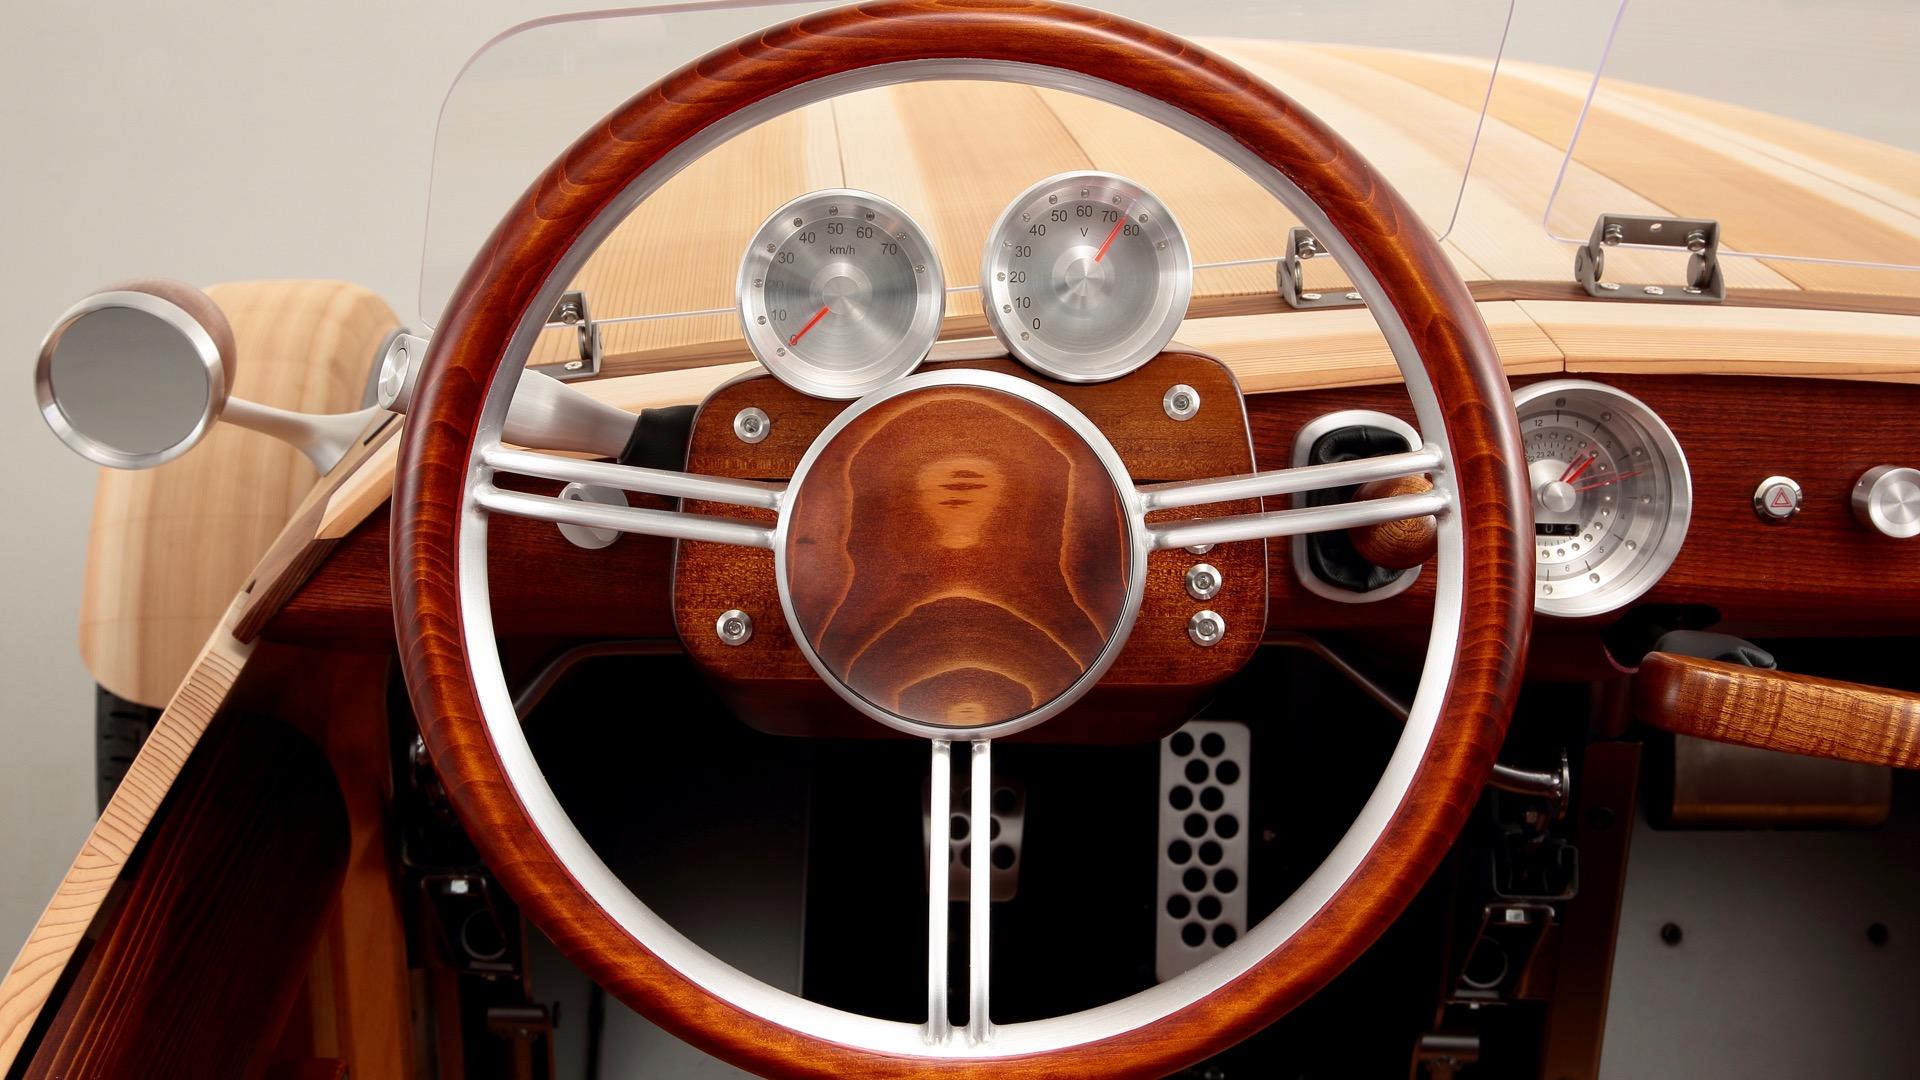 Drivers View, Toyota Setsuna, Healthy Living + Travel